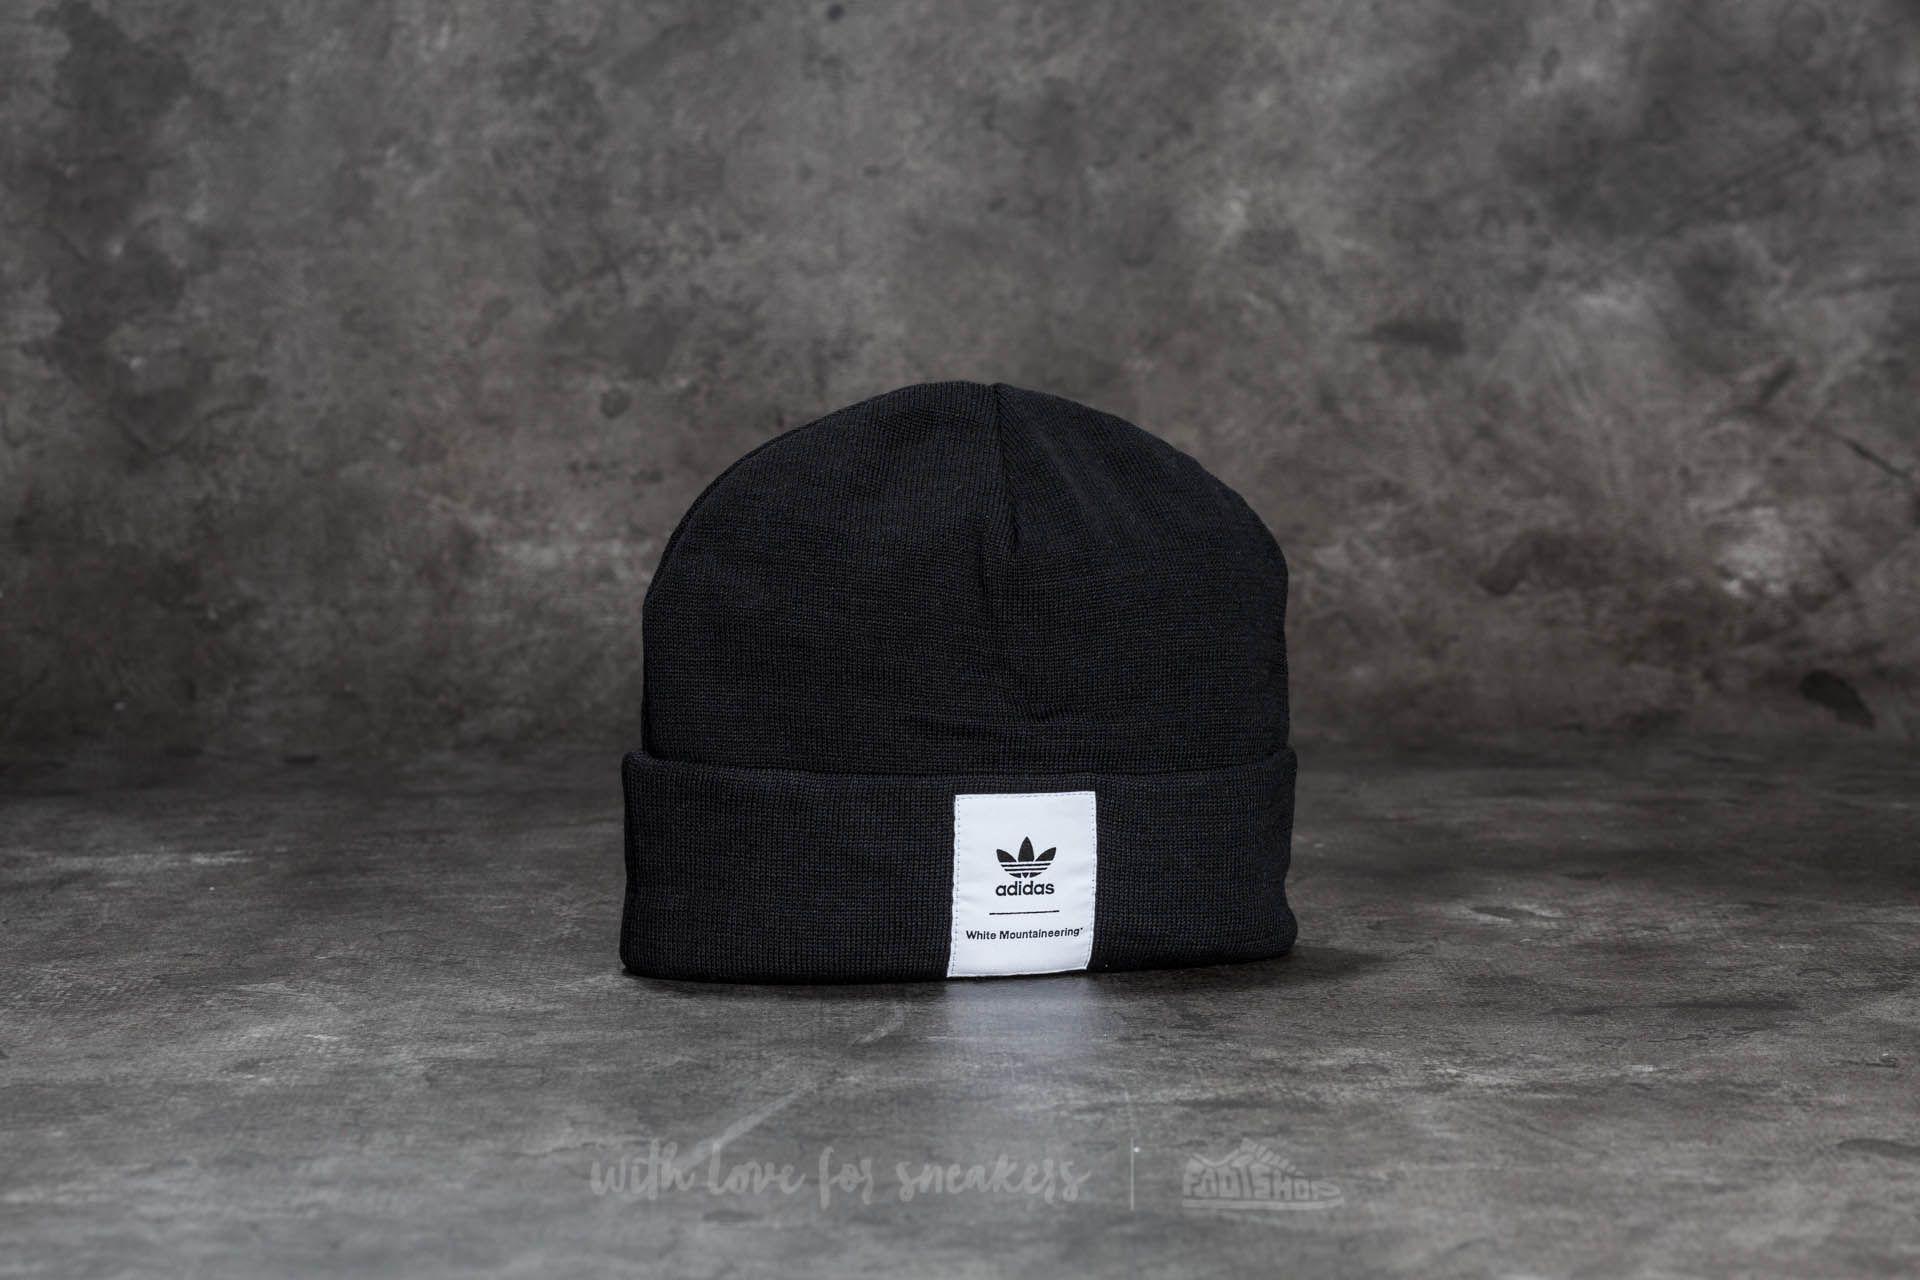 f06ba67f2195e Lyst - adidas Originals Adidas White Mountaineering Beanie Black in ...